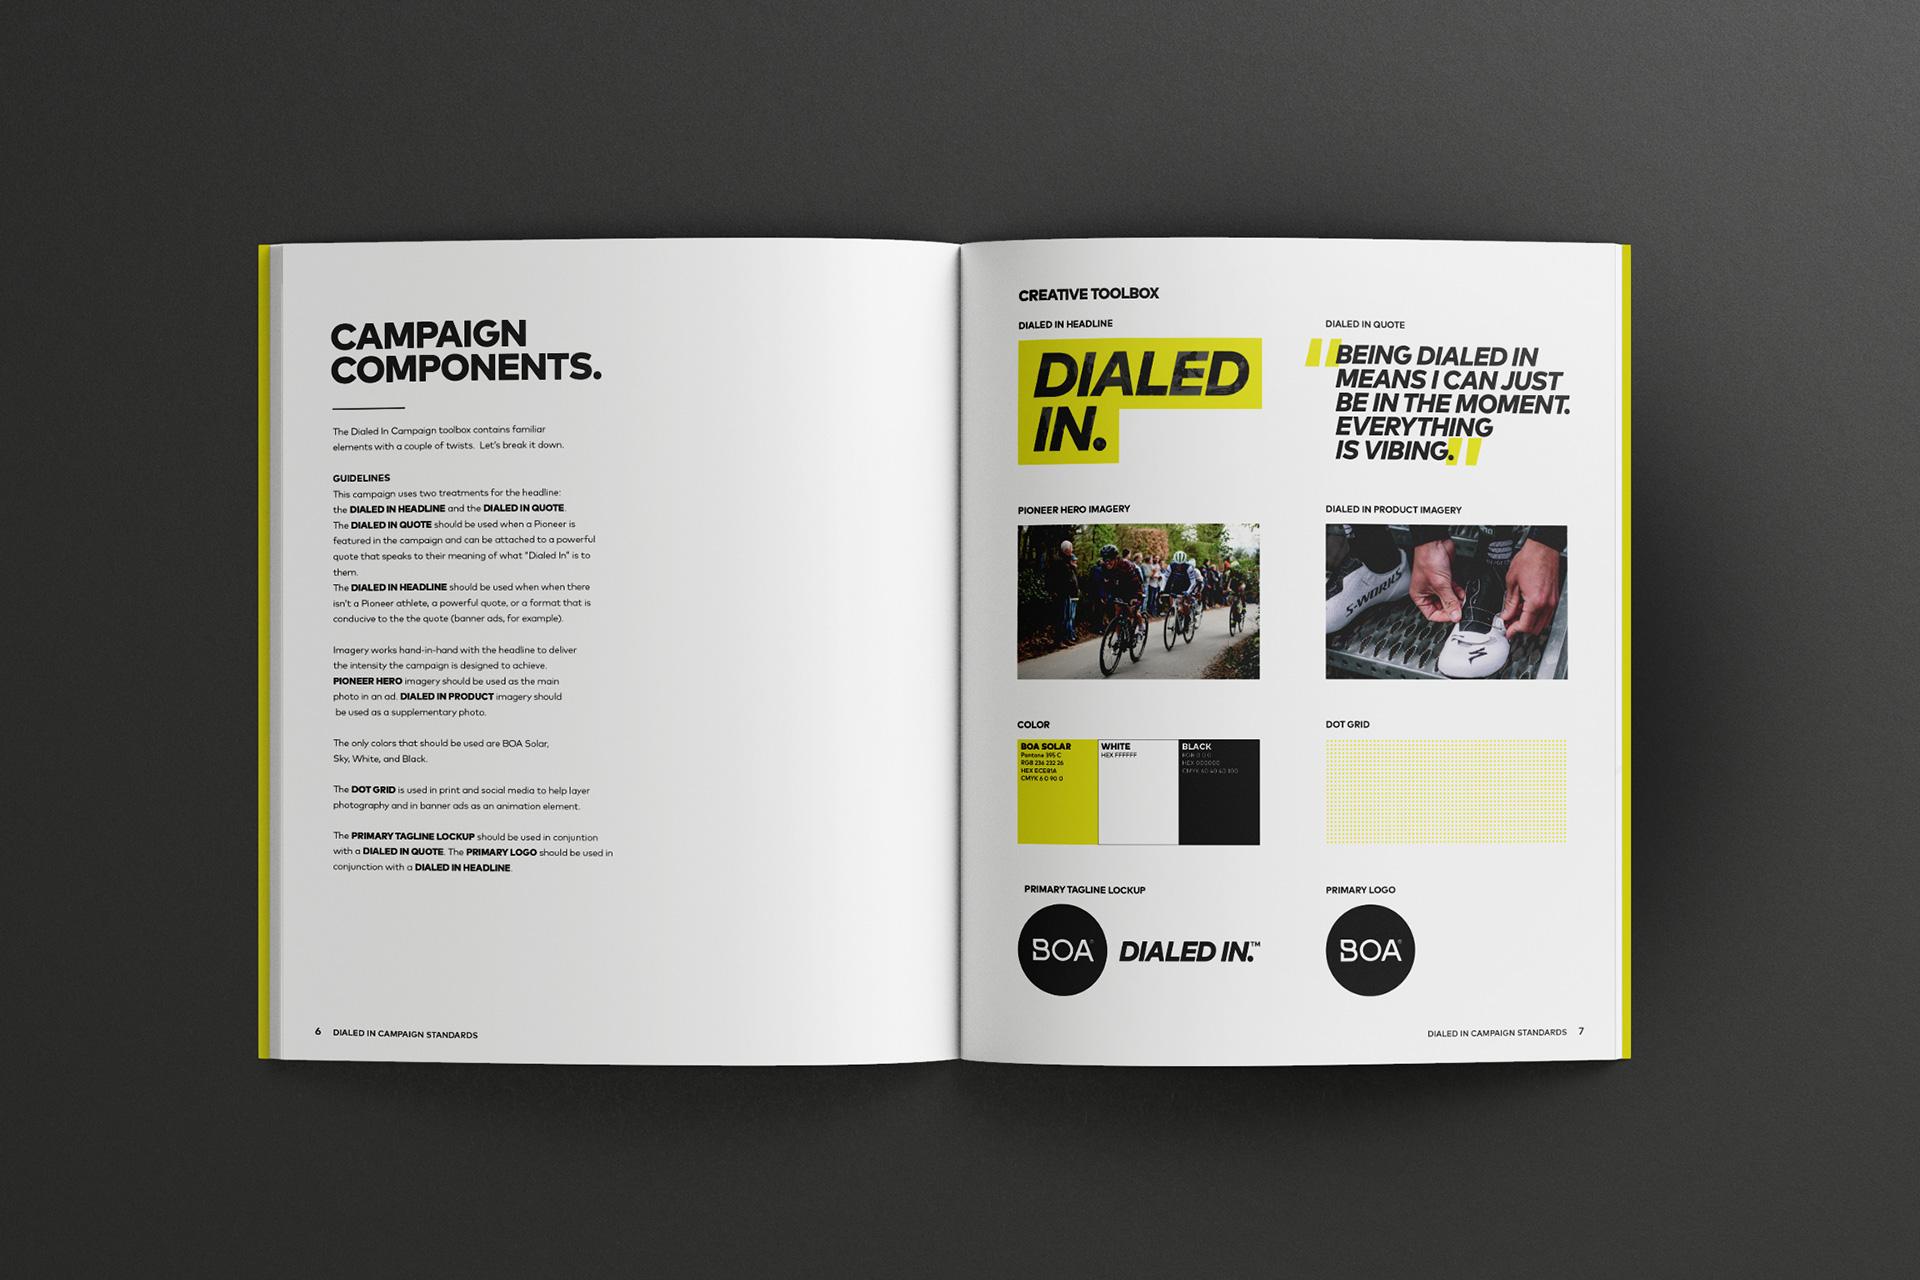 MikeSpencerDesign-DialedInCampaign-StandardsComponents-1920×1280-1